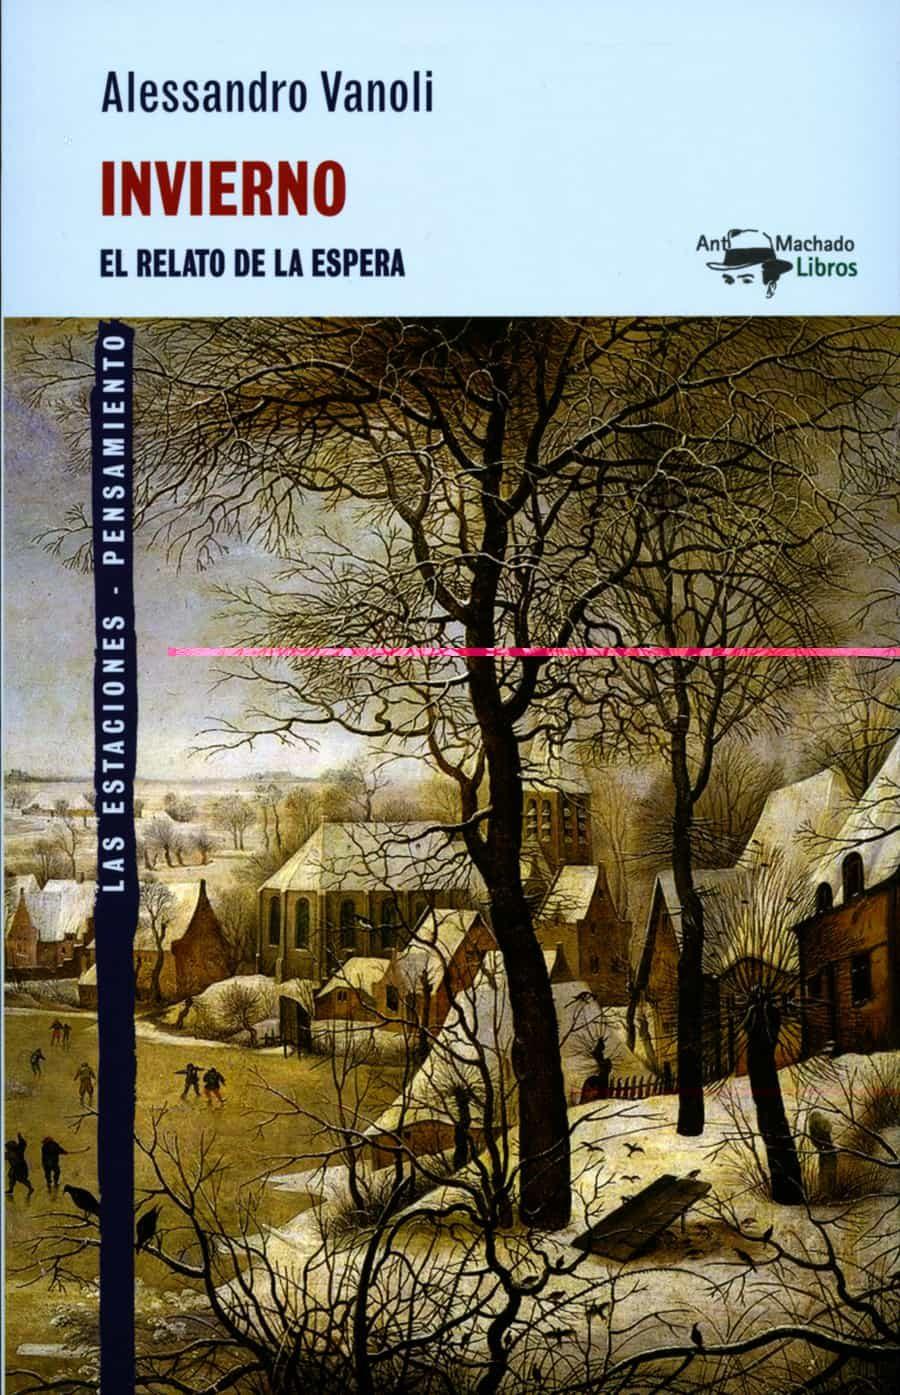 invierno: el relato de la espera-alessandro vanoli-9788477748953